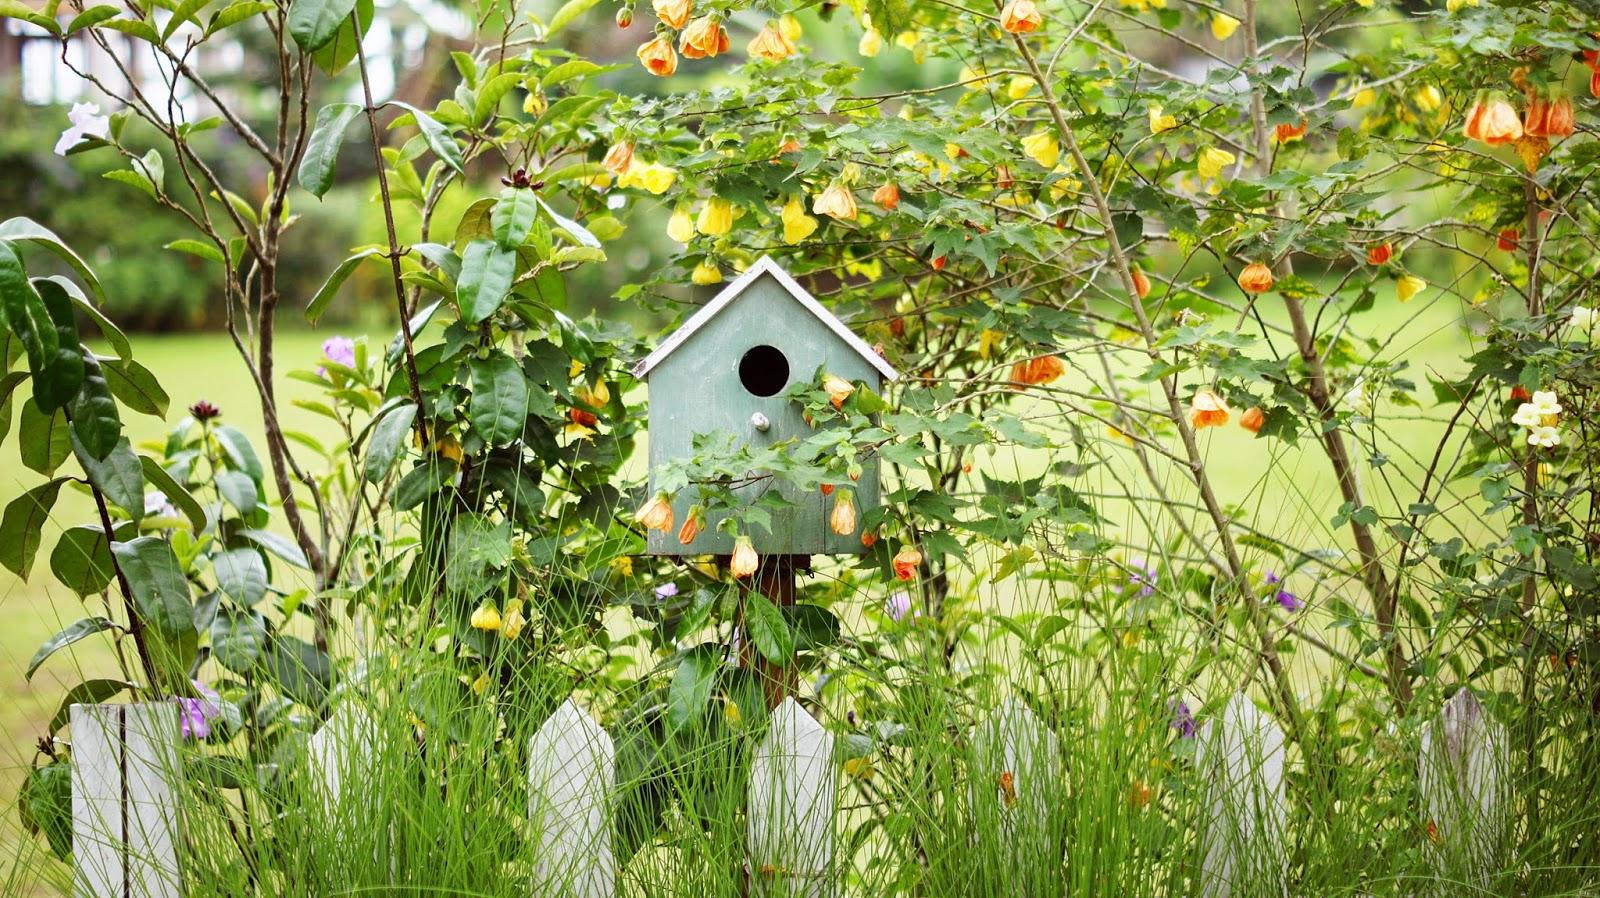 My Secret Garden: Nazura Gulfira: My Secret Garden